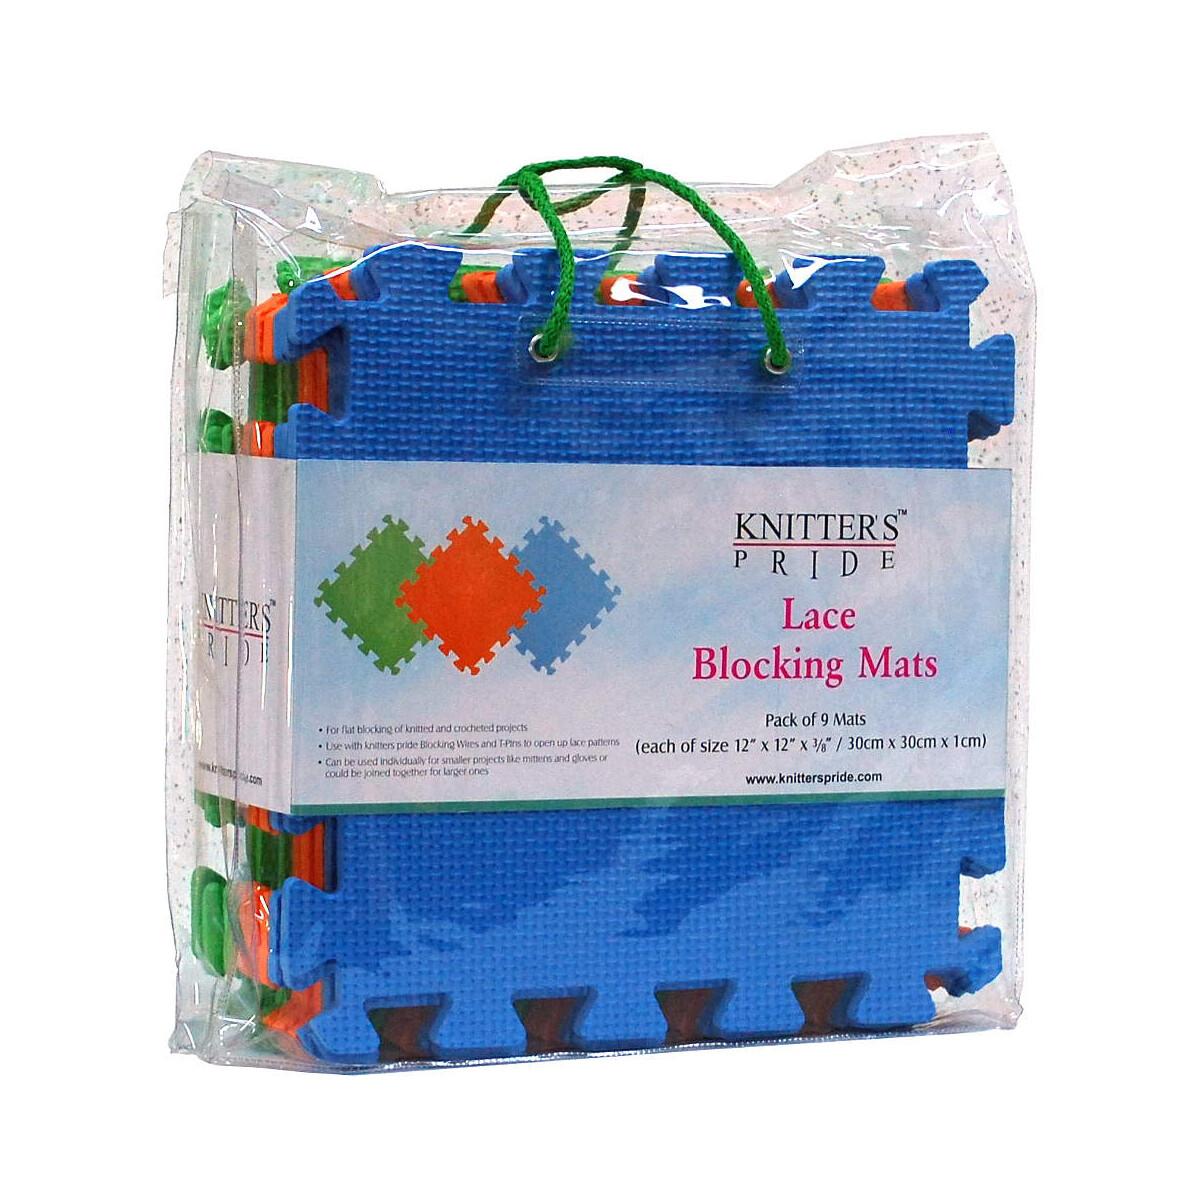 Knitter's Pride - Lace Blocking Mats - Pkg Of 9